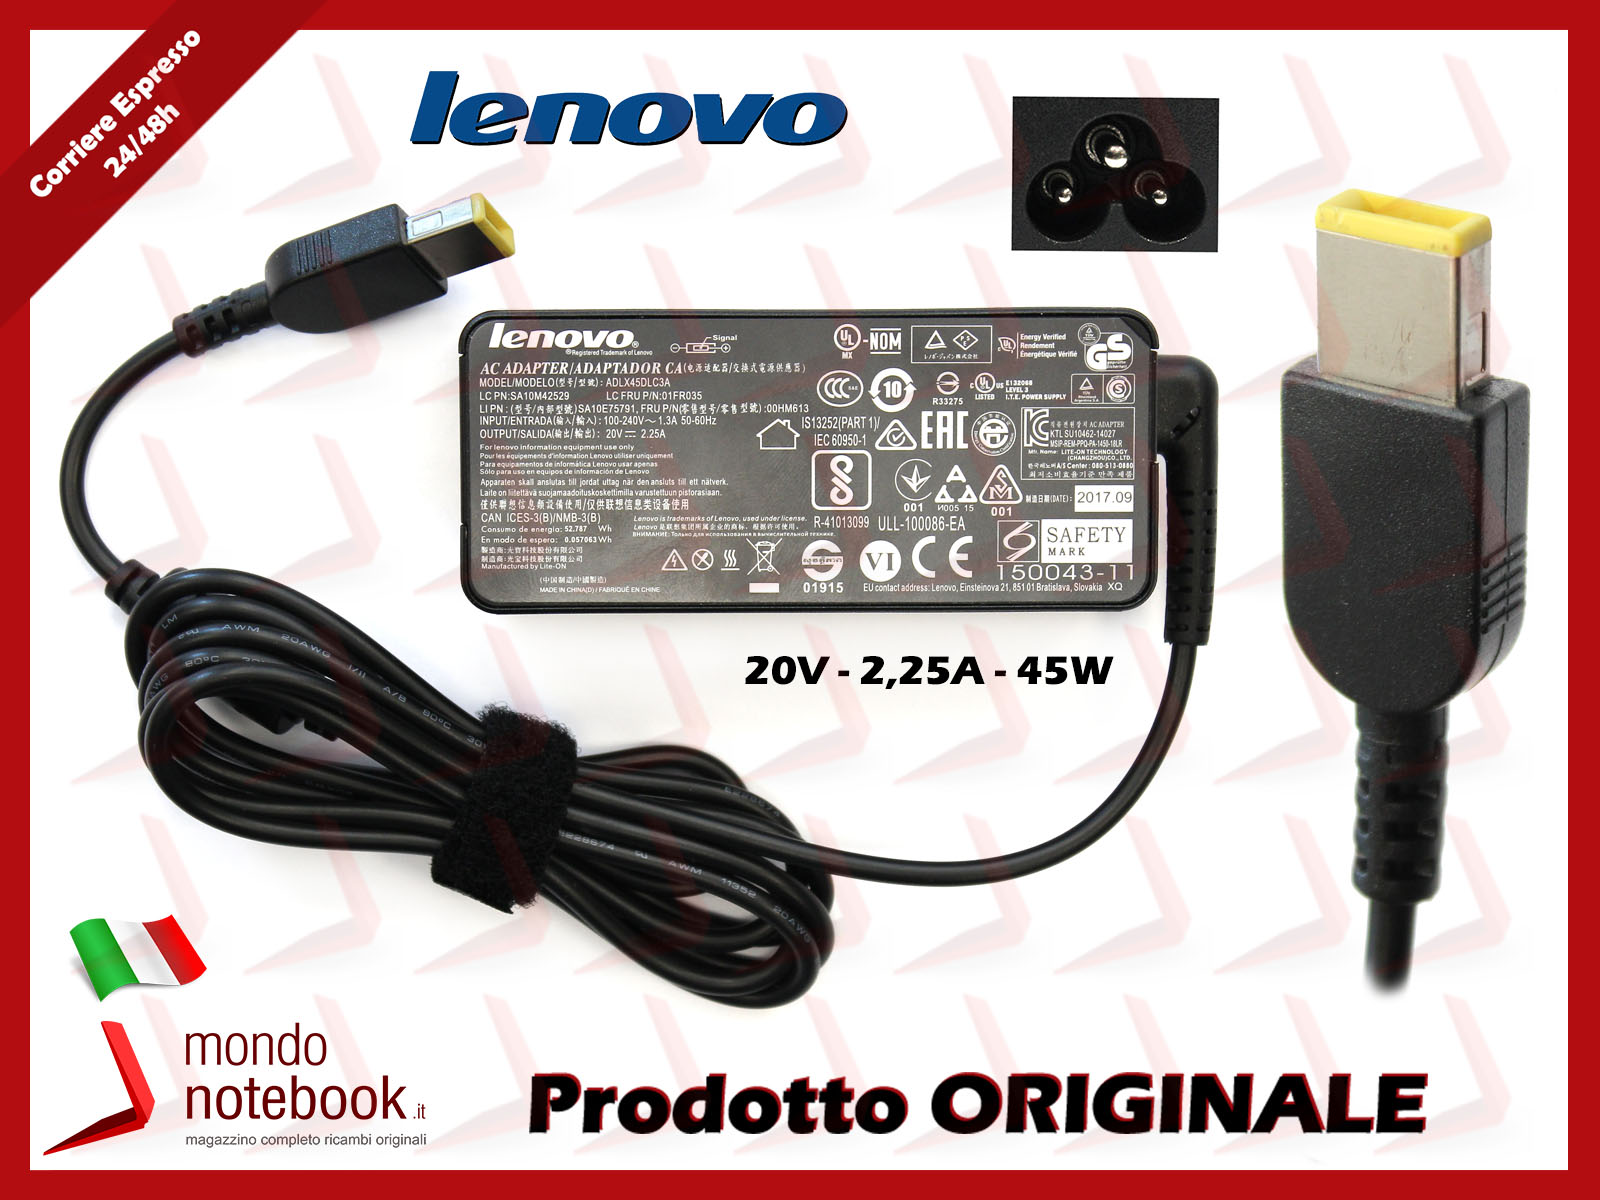 Lenovo ThinkPad L530 Notebook Compatibile Adattatore Caricabatterie